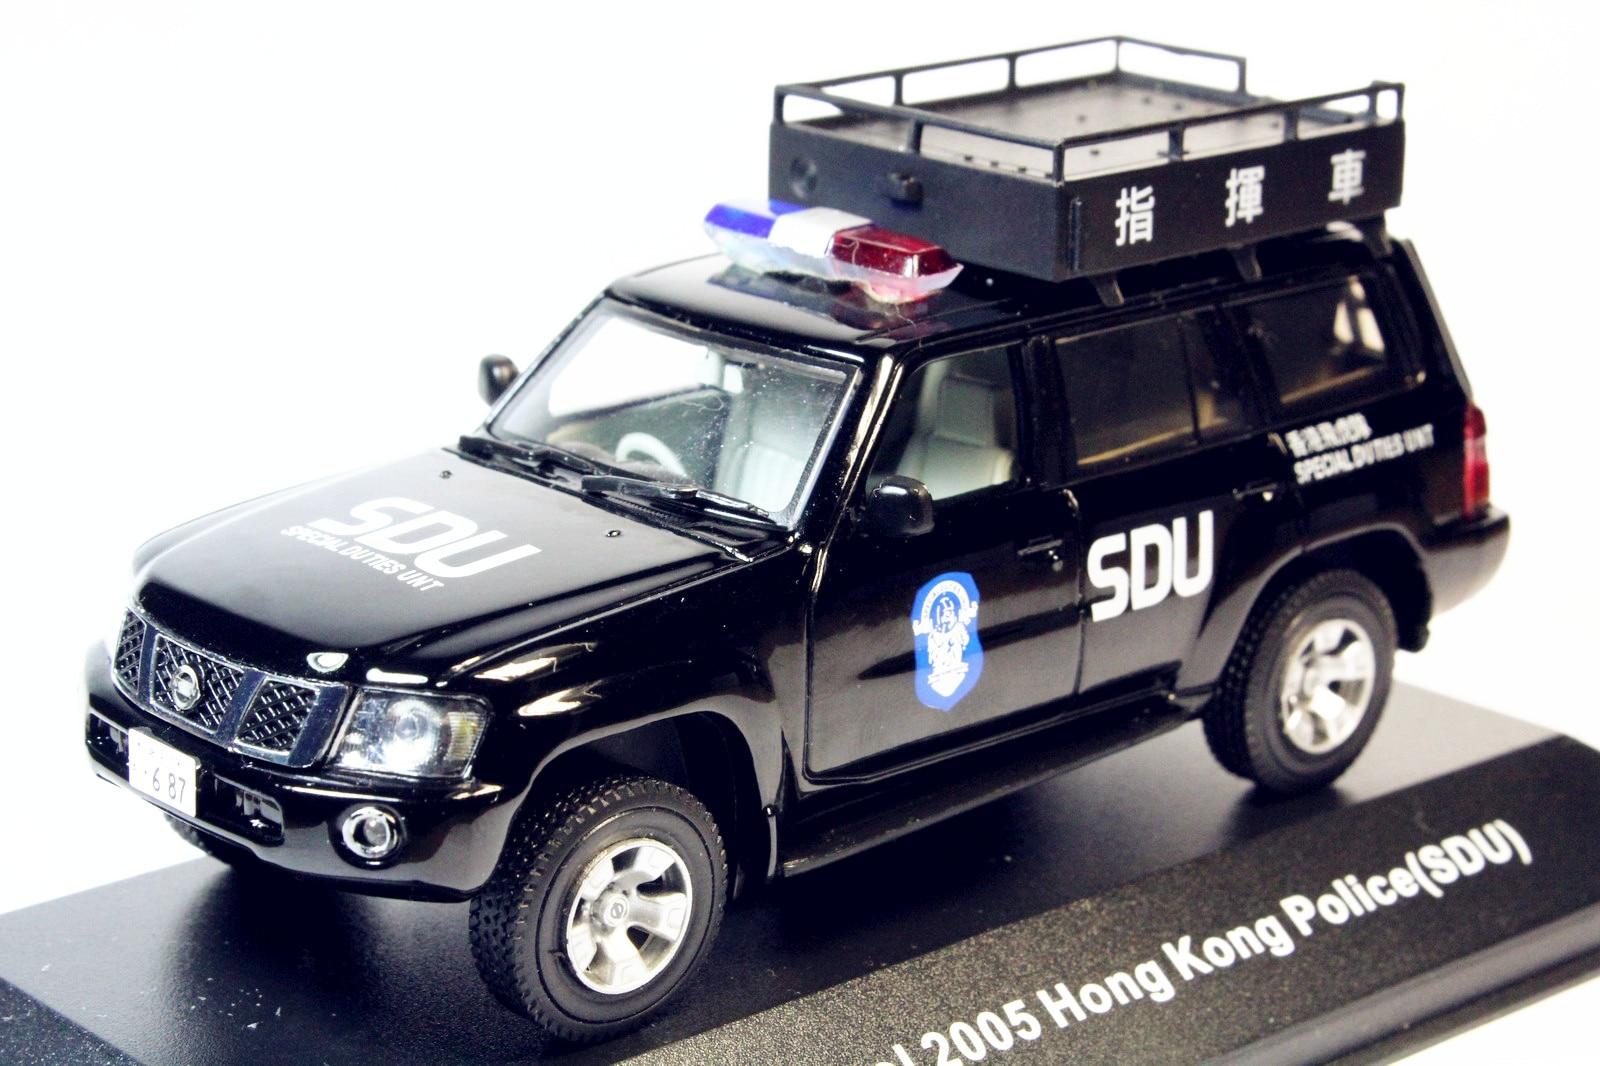 J-collection 1/43 Nissan Patrol 2005(Y61) Hong Kong Police(SDU) Command Car